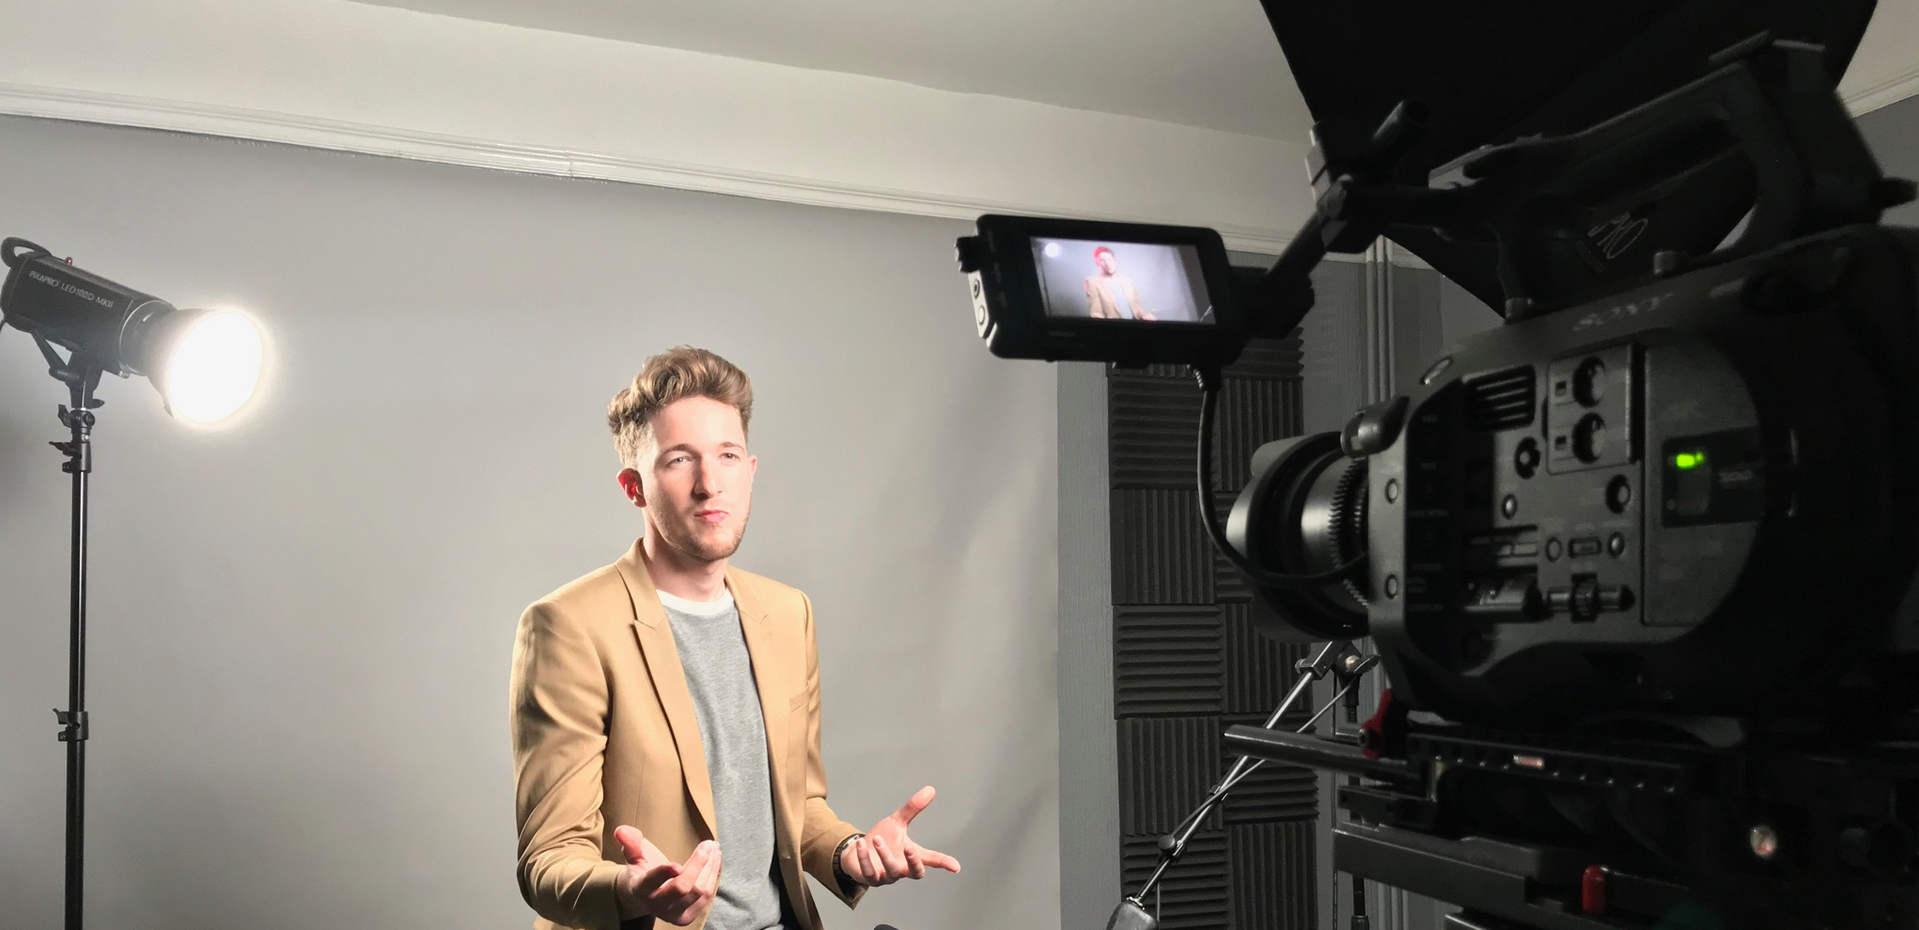 James Tzsanoudakis Interview setup.JPG